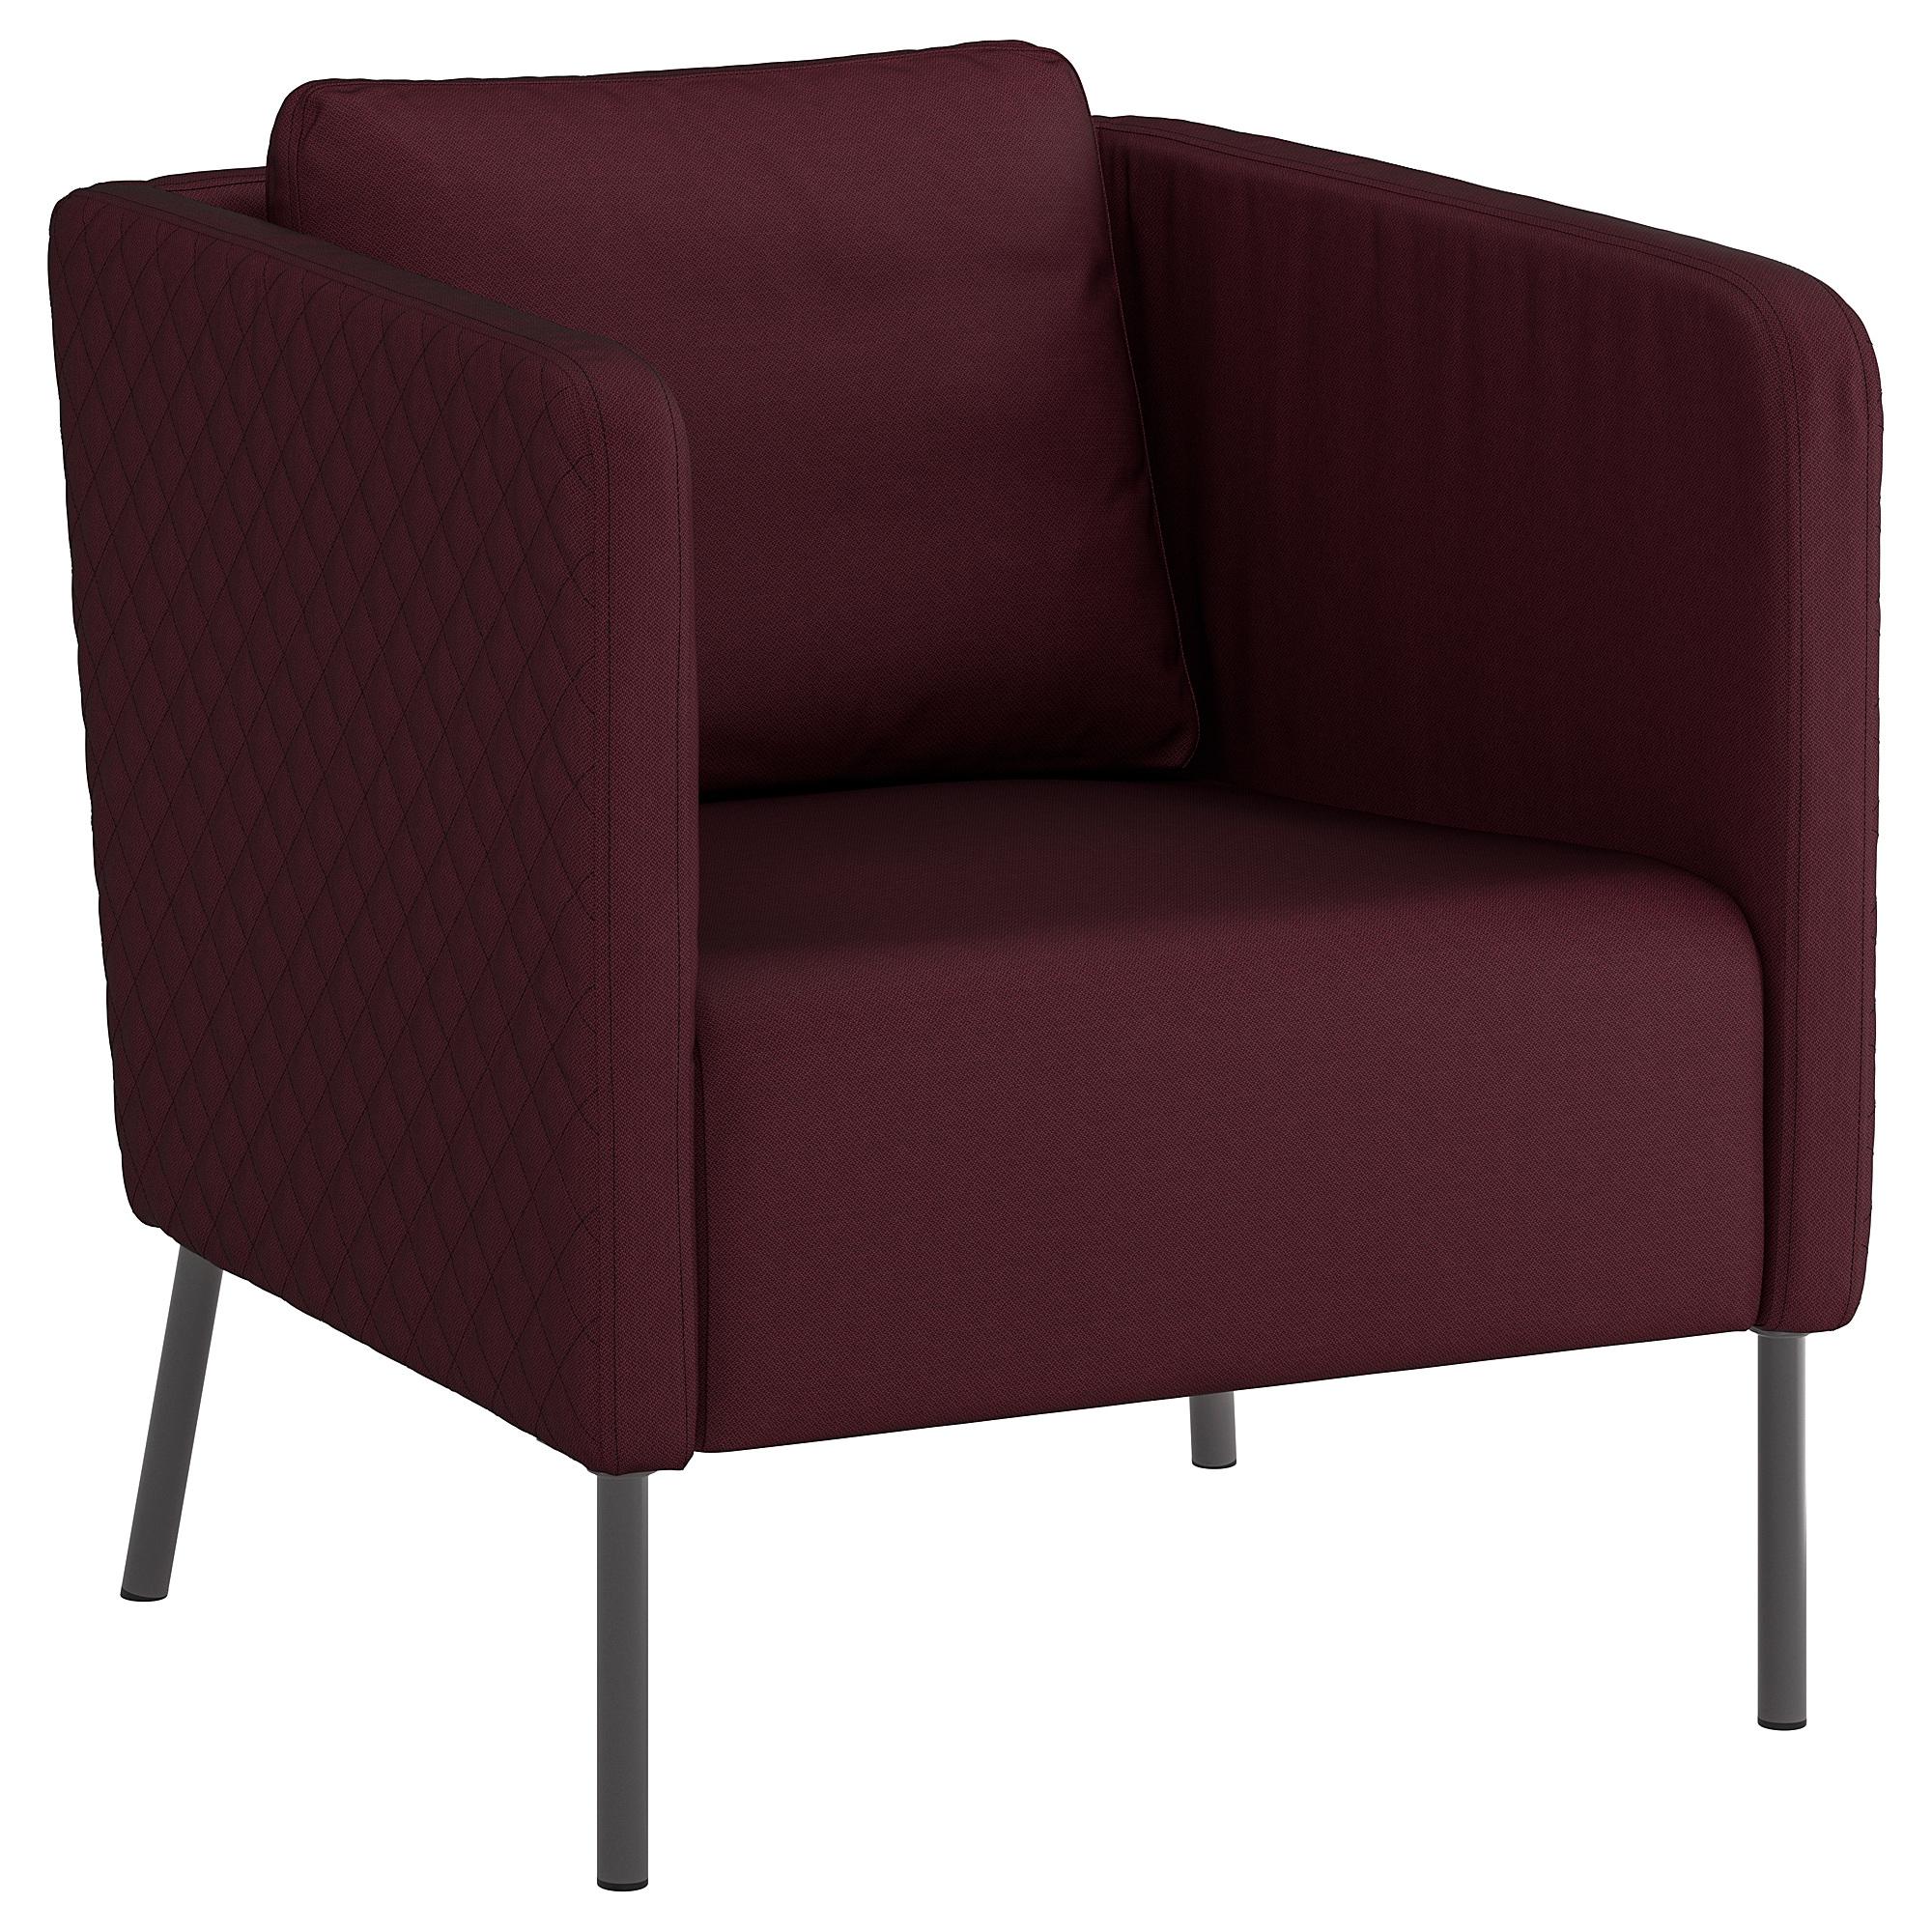 Ikea In Latest Ikea Sofa Chairs (View 16 of 20)